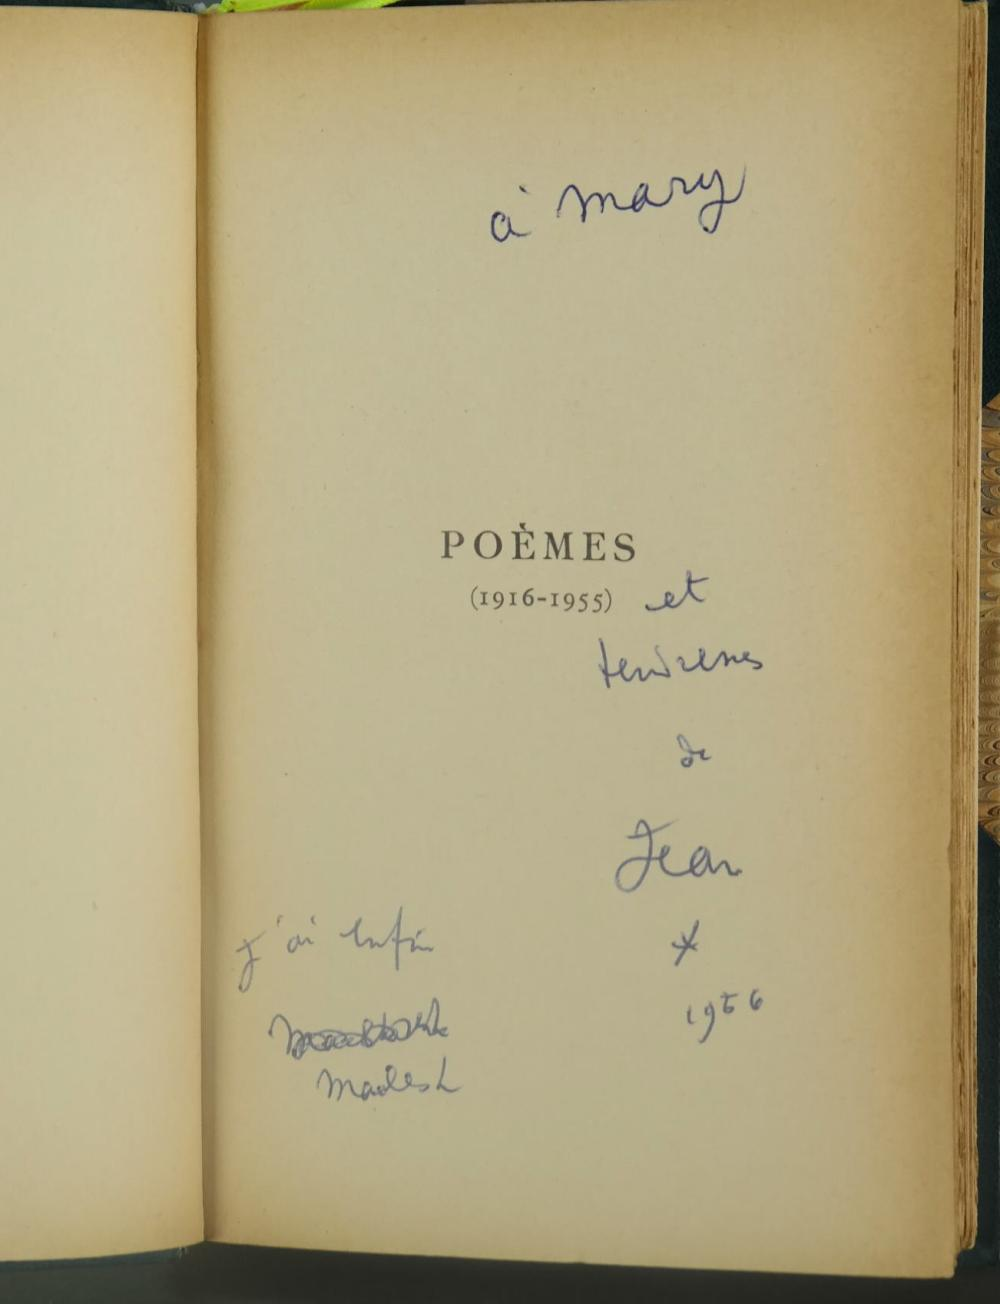 Lot 213: Cocteau. Poemes. 1916-1955. Sgd/inscr/illus.